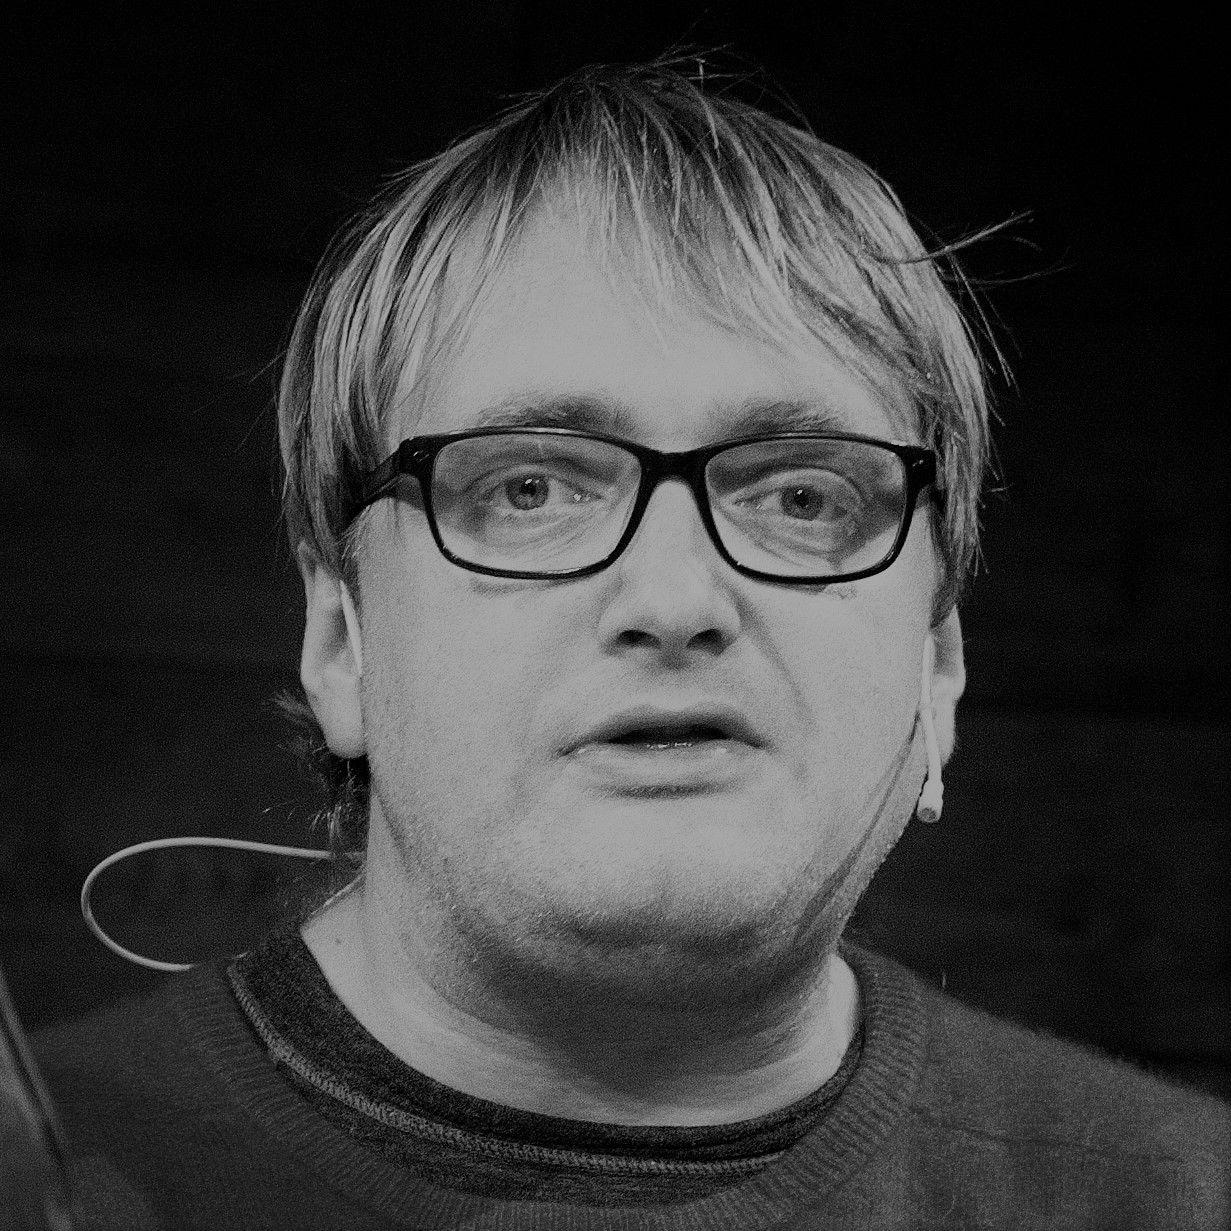 Thomas Anthun Nielsen